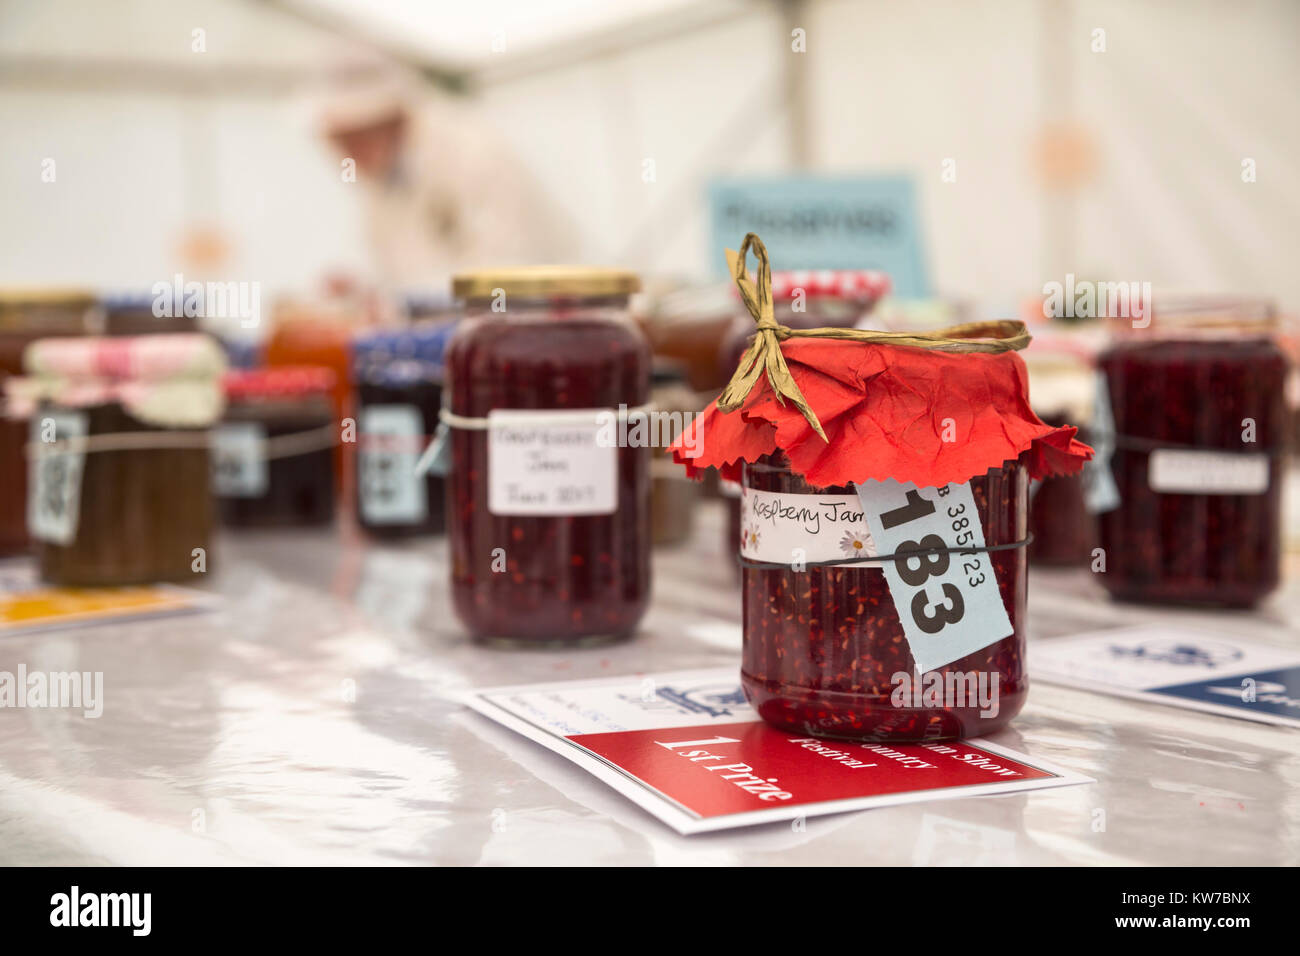 Prize-winning preserve, home industries tent, Bellingham Show, Bellingham, Northumberland, UK, August 2017 - Stock Image